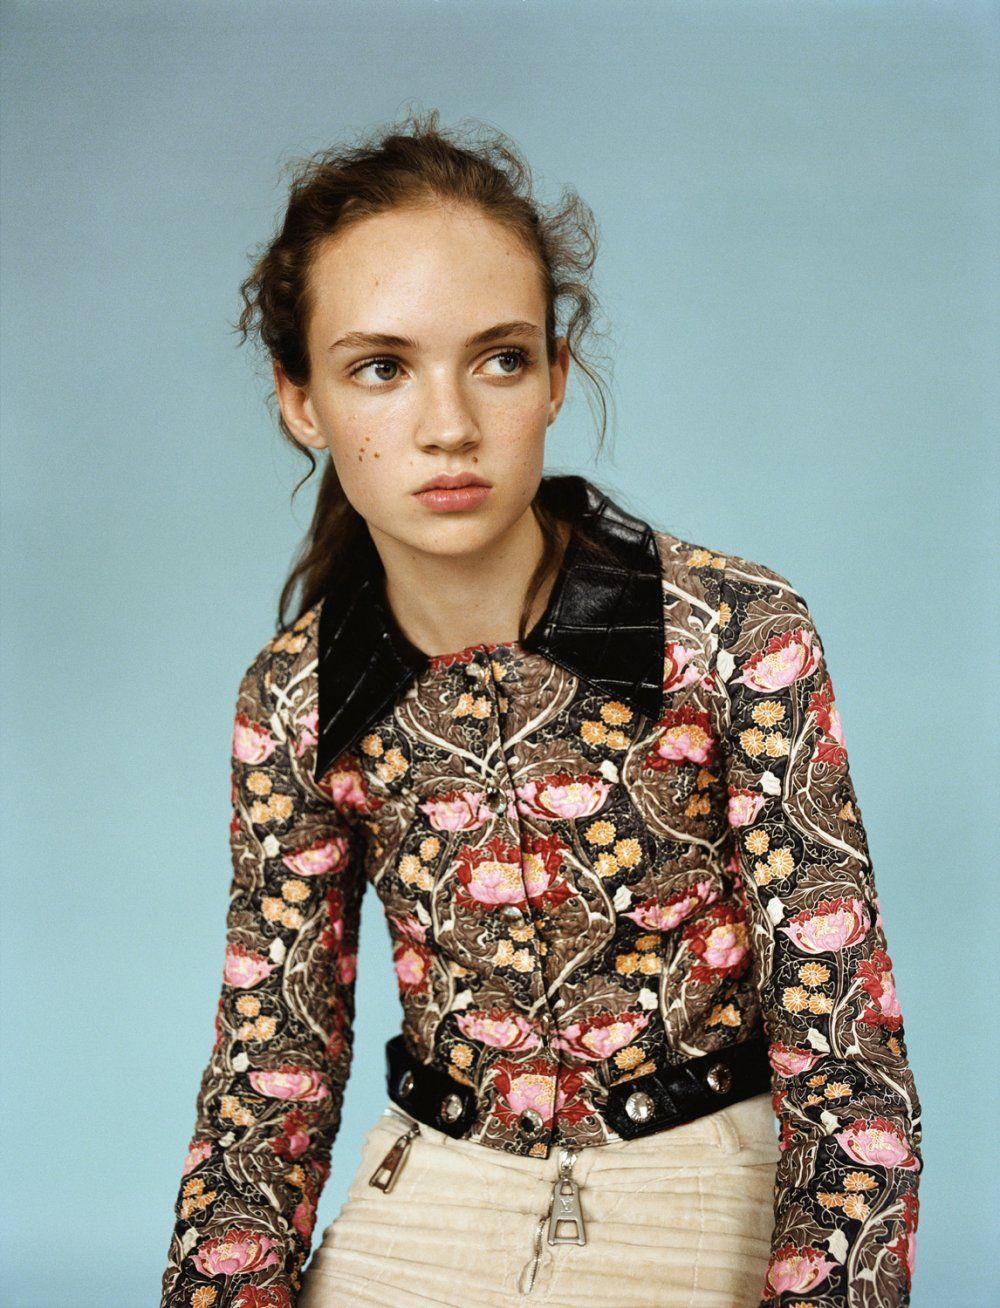 Twin Magazine #12 Model: Adrienne Jüliger Photography: Matteo Montanari Styling; Celestine Cooney